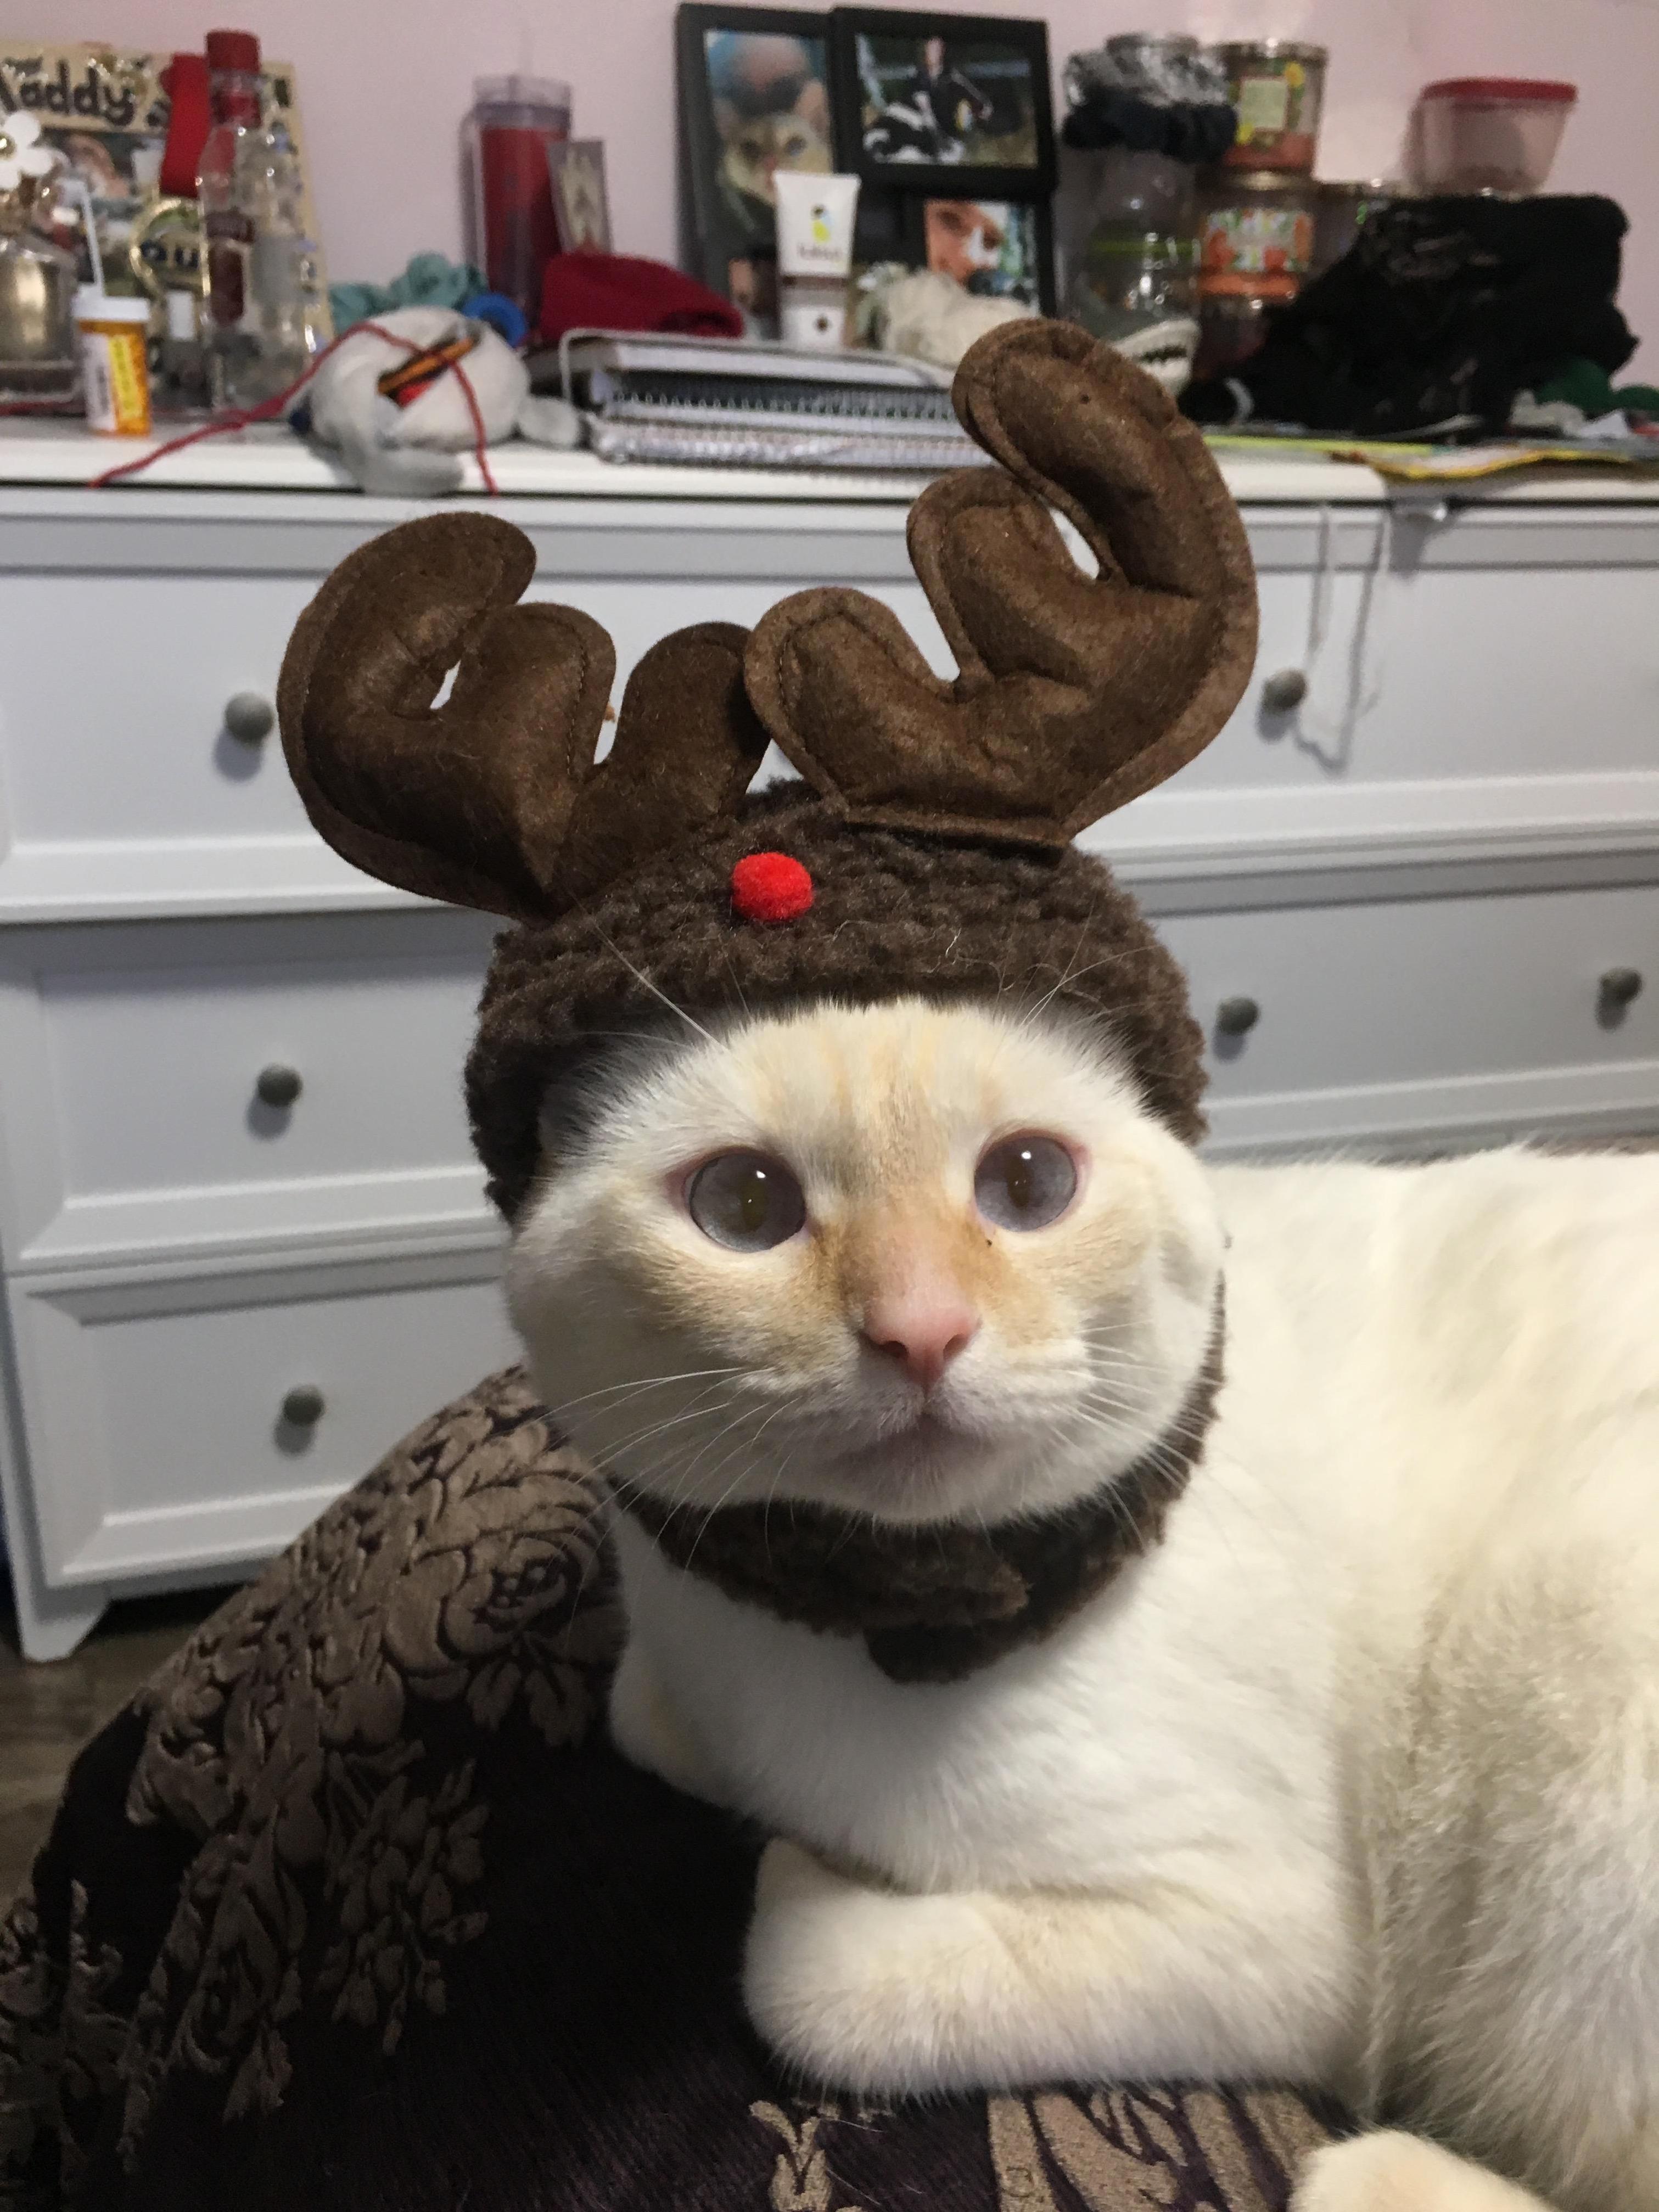 Chubs loves wearing his antler hat.